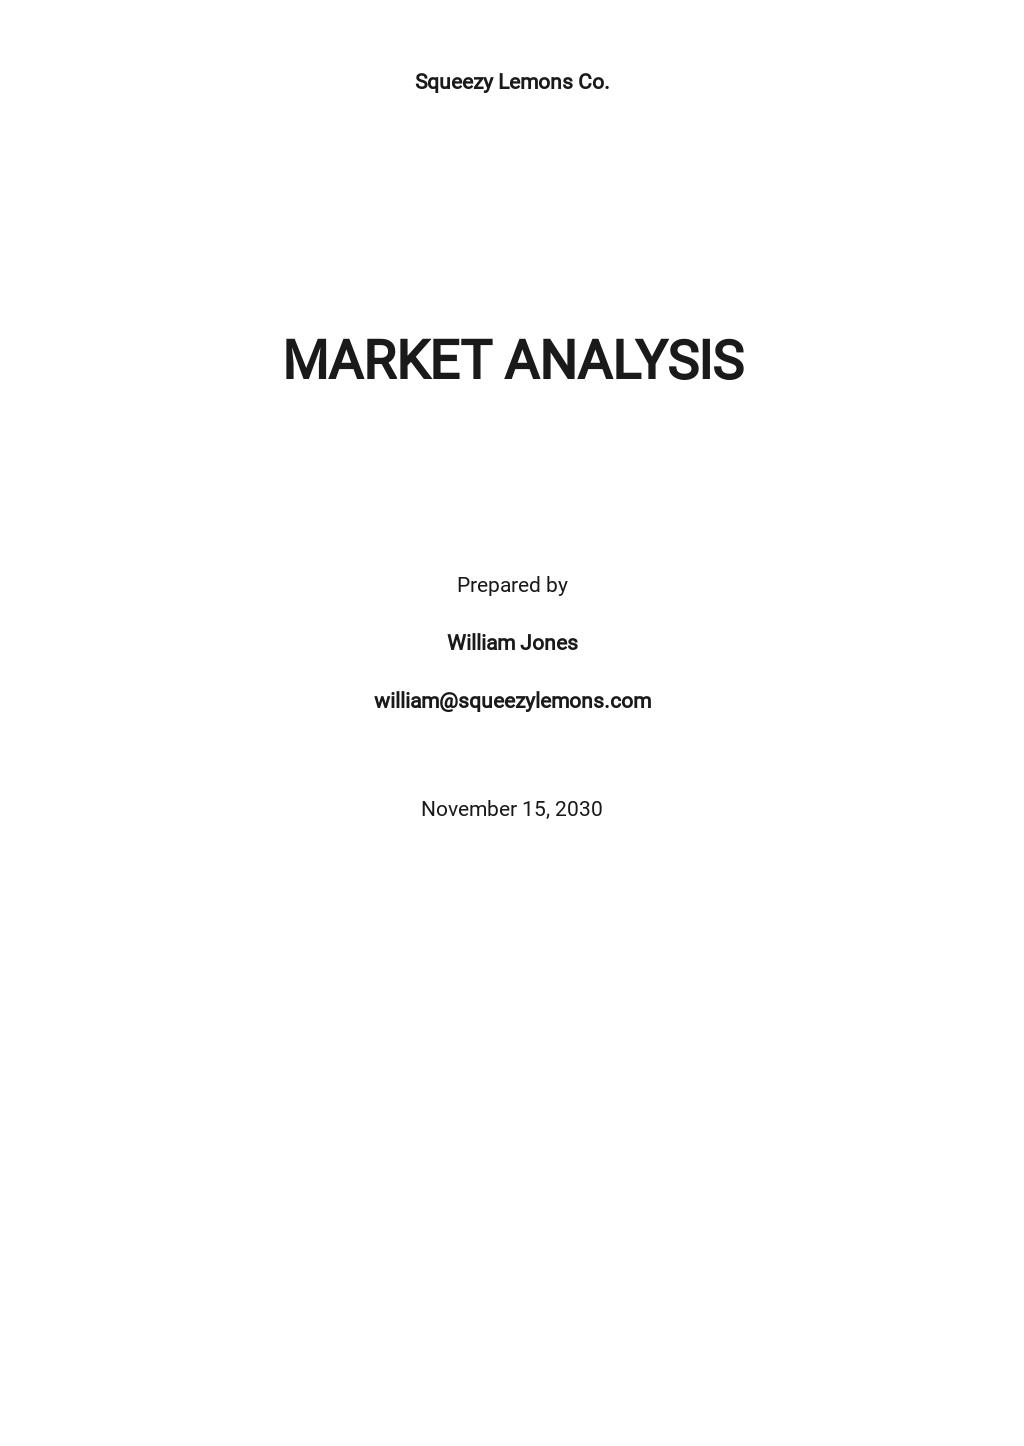 Blank Market Analysis Template.jpe